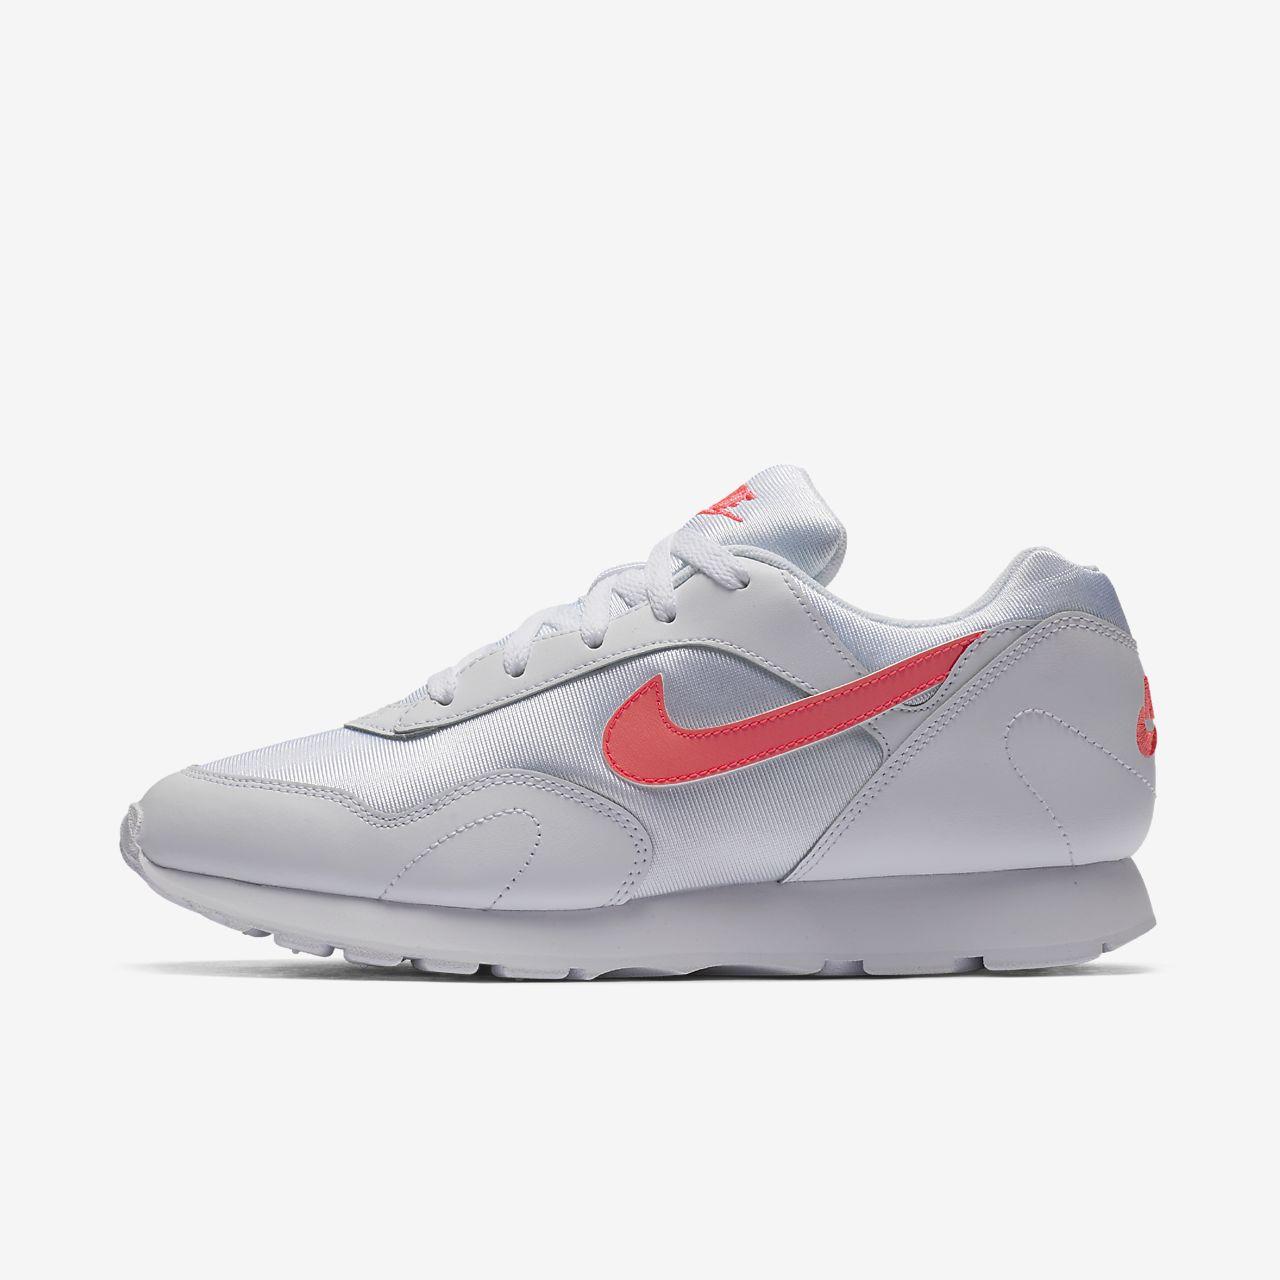 Nike SportswearOUTBURST - Trainers - white/light retro/black 2HRzSm8